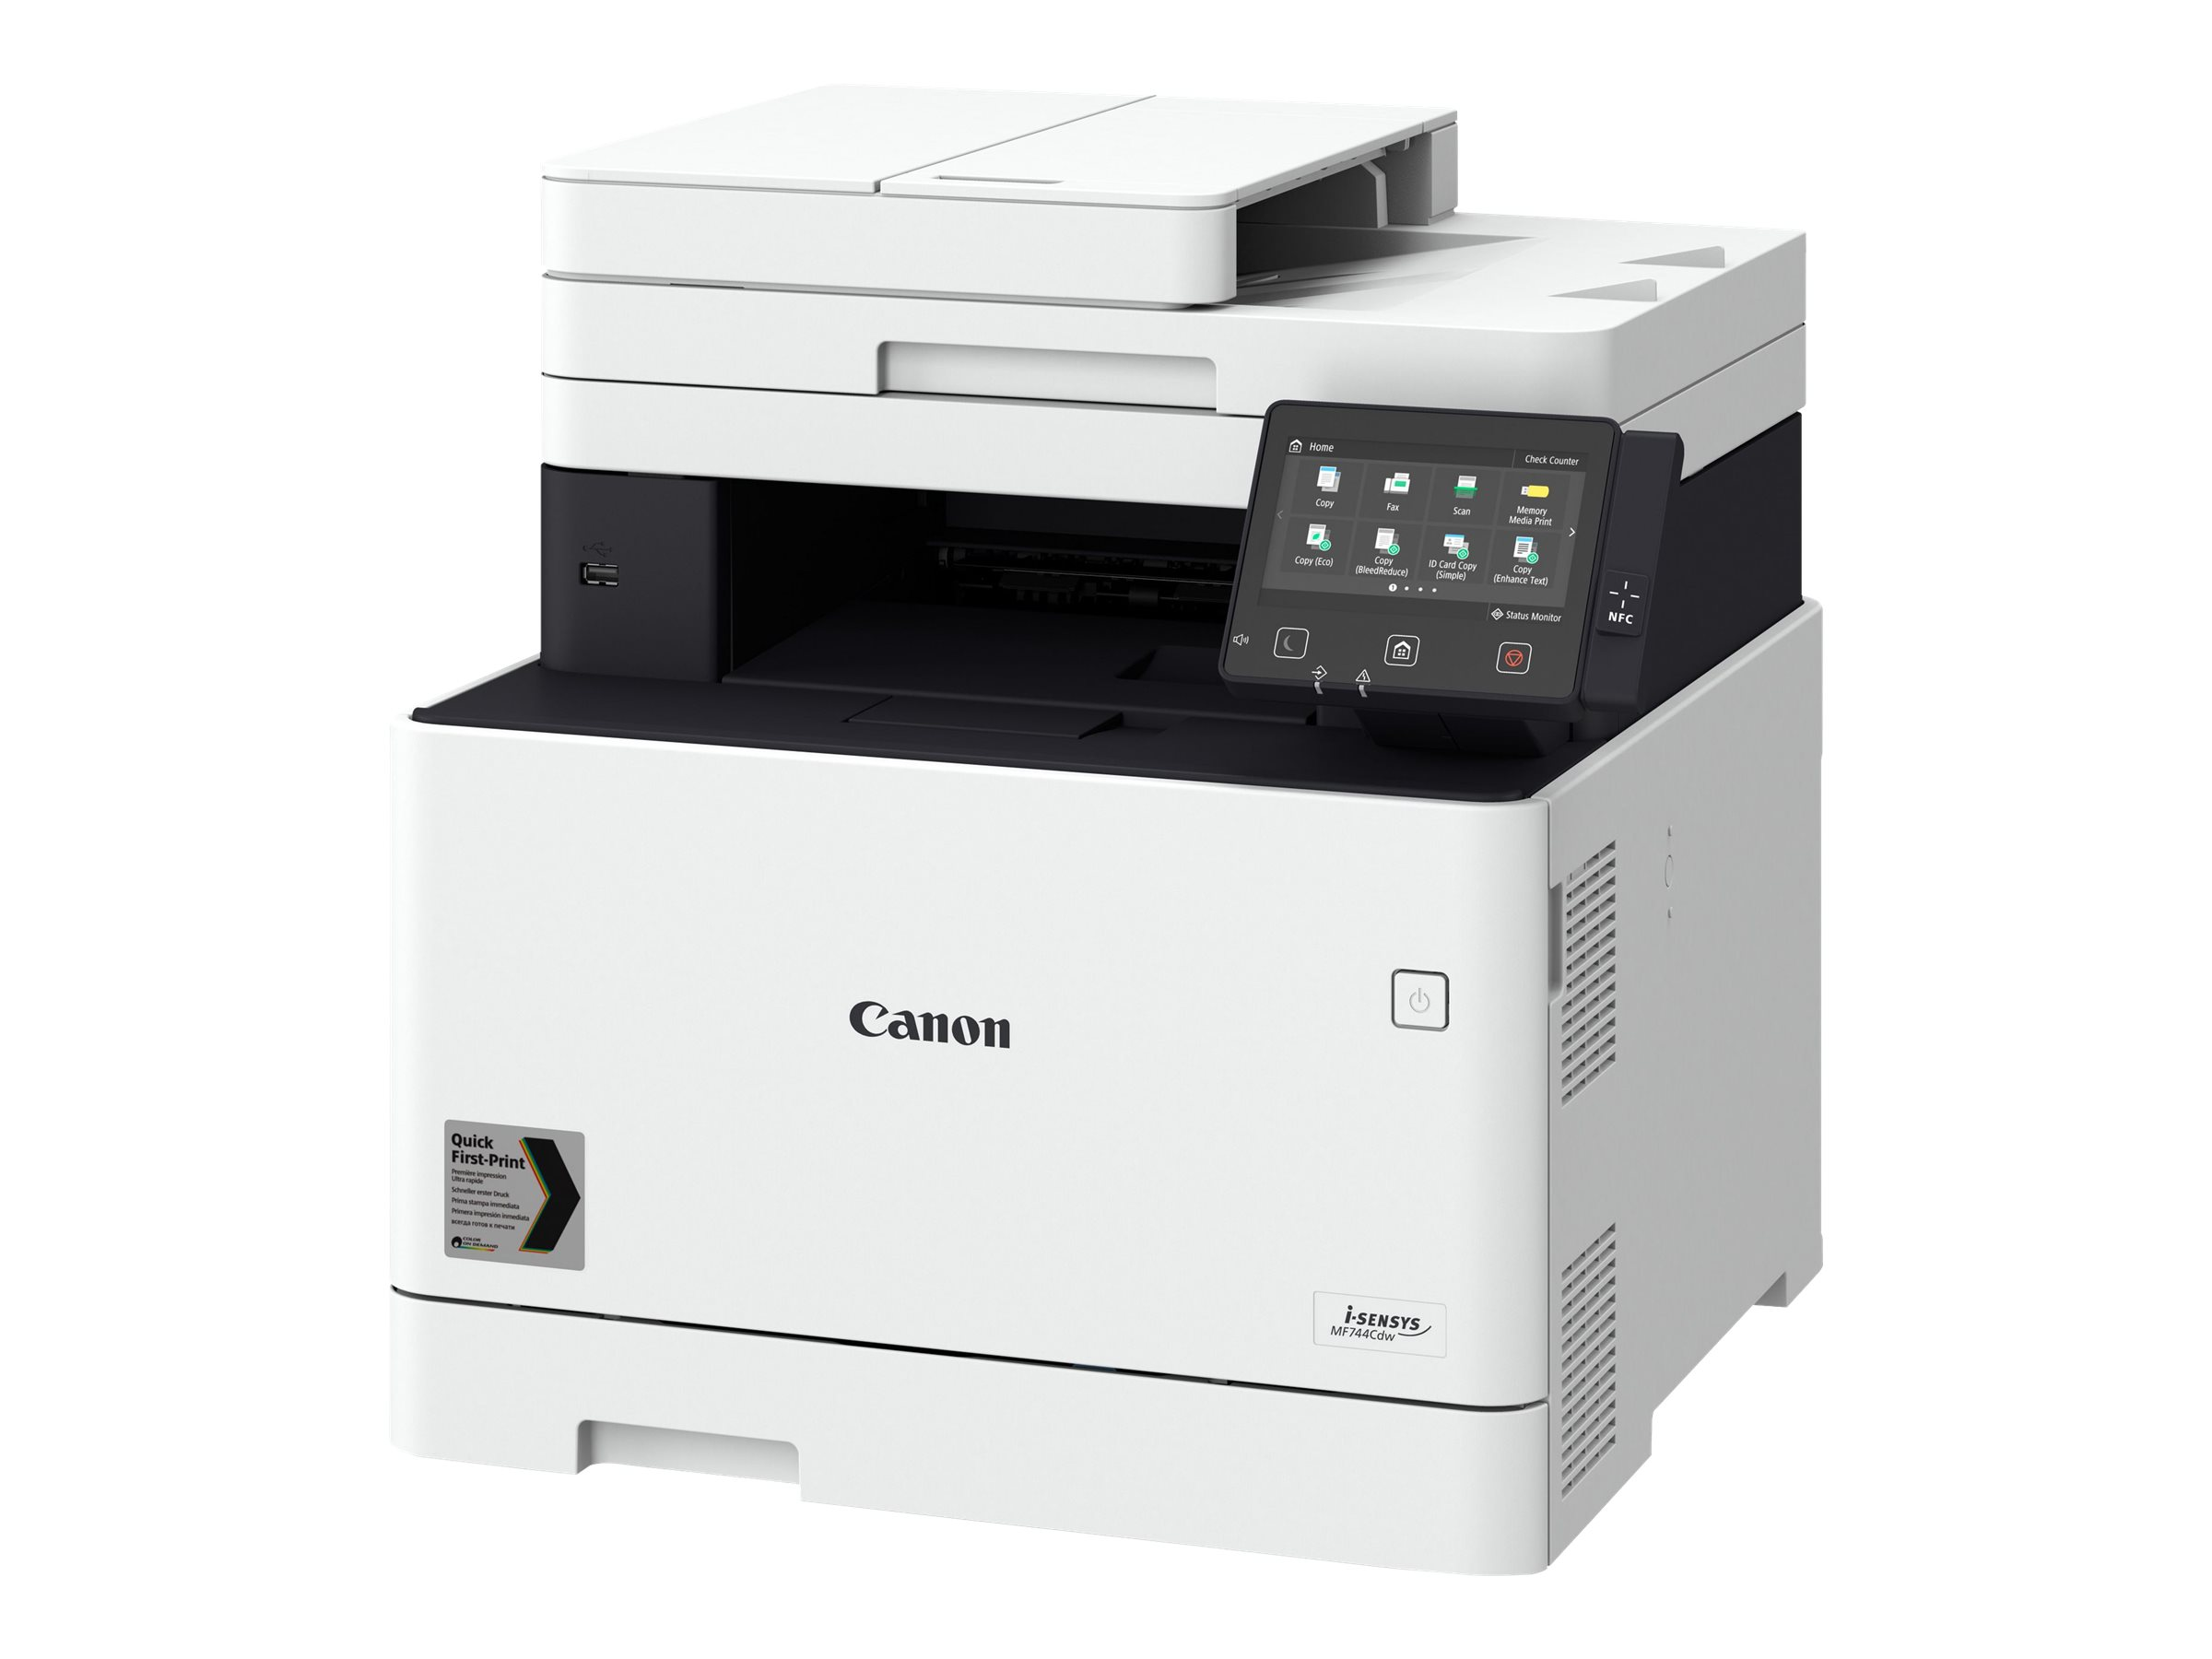 Canon i-SENSYS MF744Cdw - Multifunktionsdrucker - Farbe - Laser - A4 (210 x 297 mm)